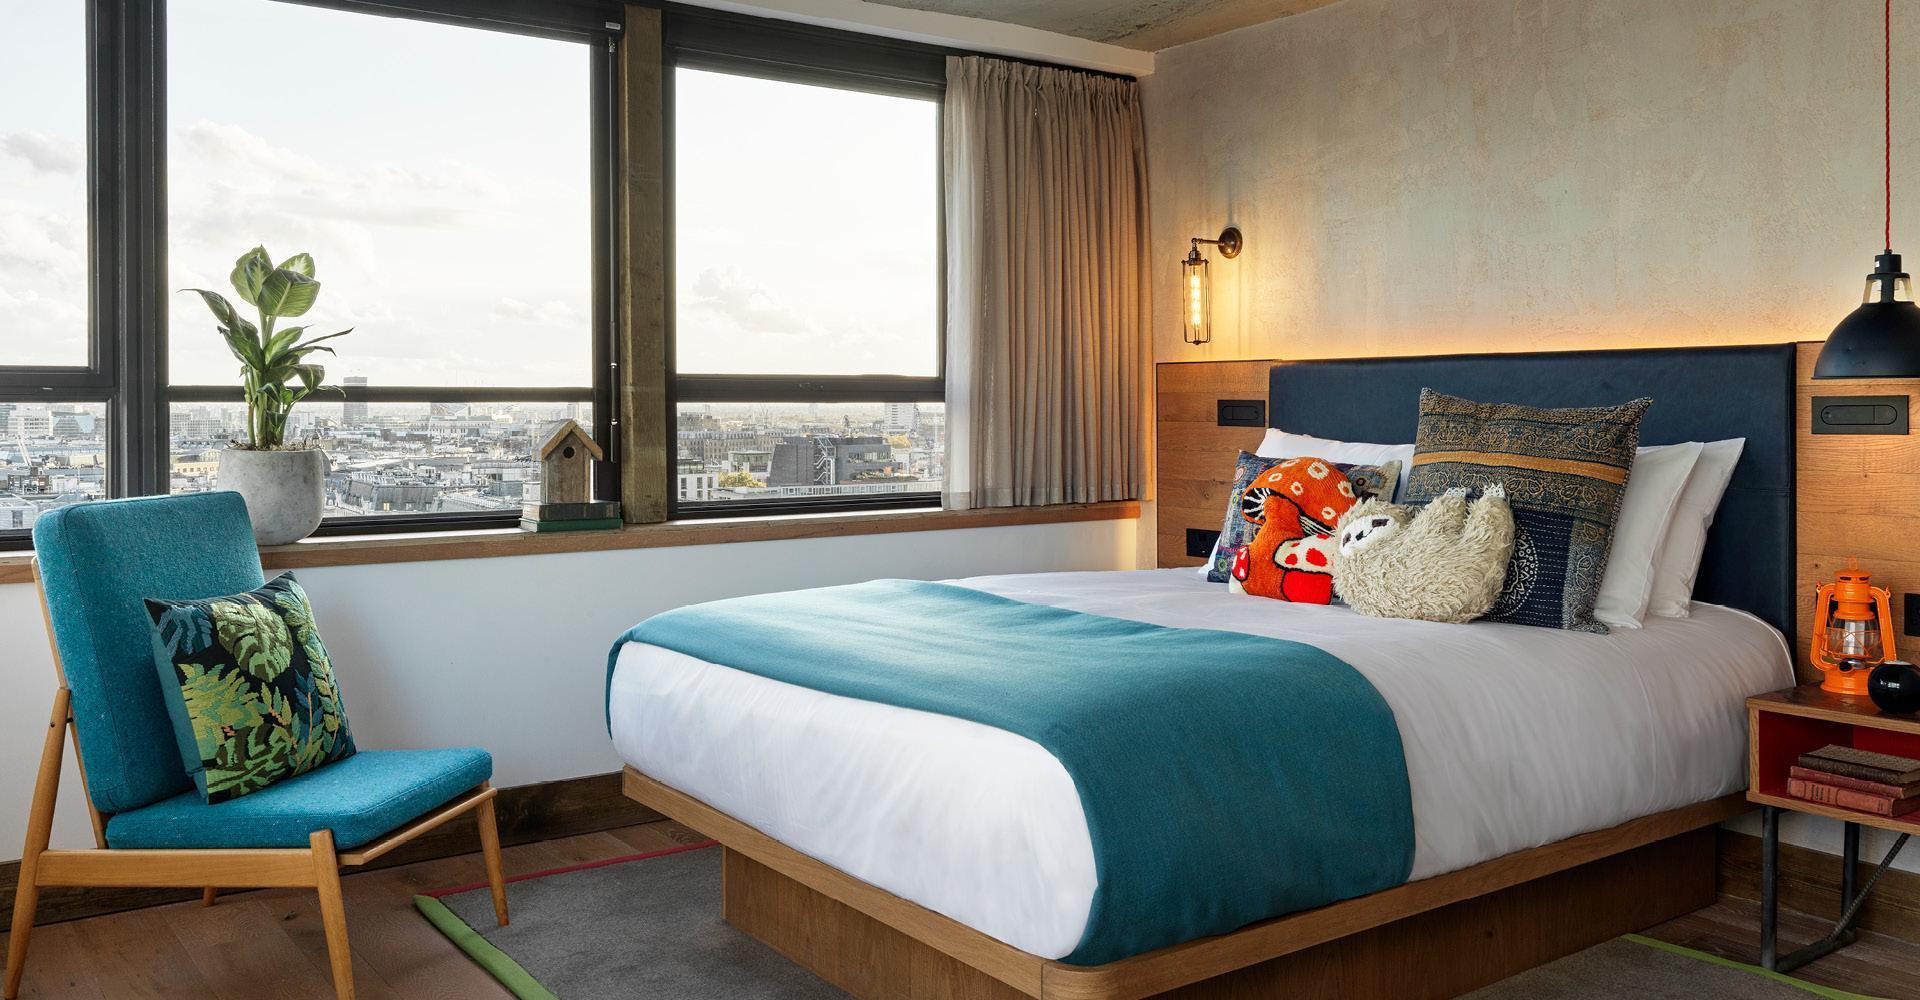 Skyline Queen Bed with Window views